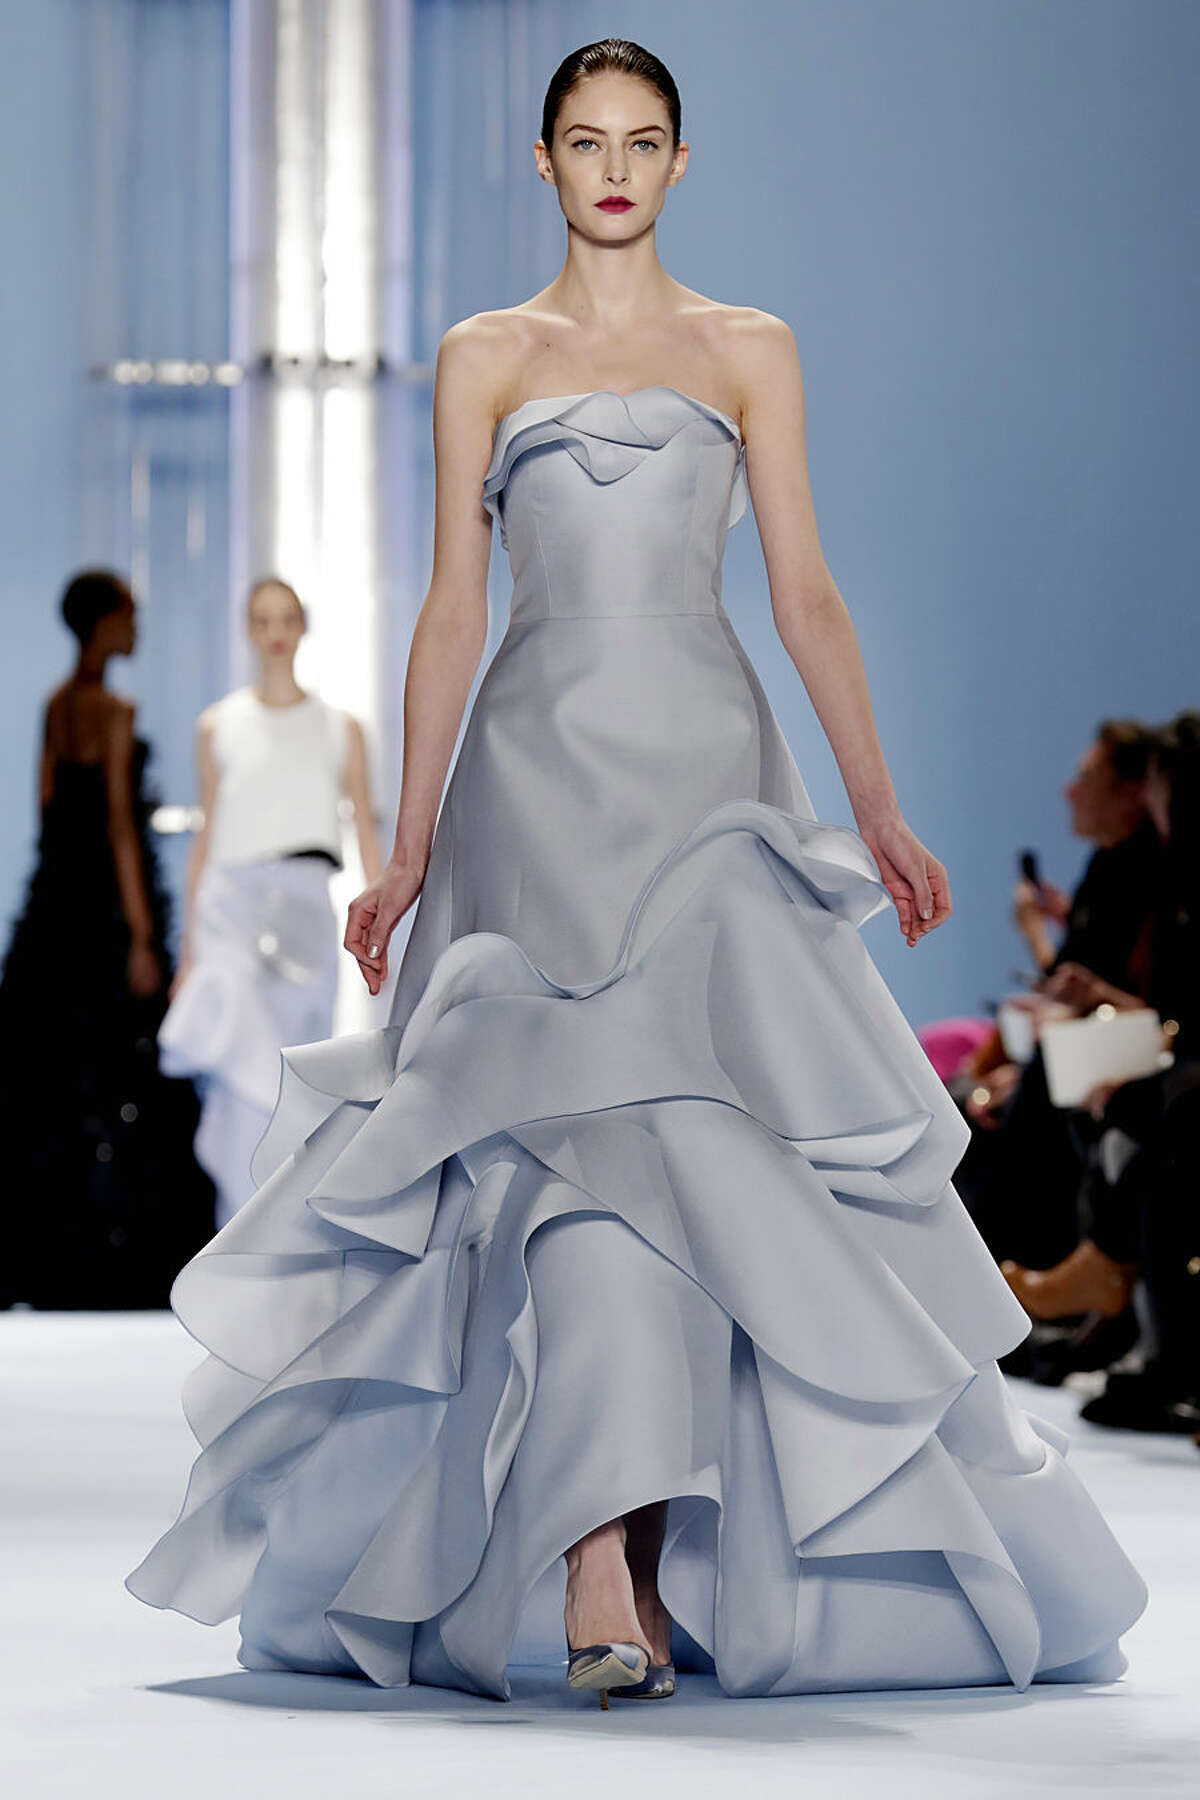 The Carolina Herrera Fall 2015 collection is modeled during Fashion Week in New York, Monday, Feb. 16, 2015. (AP Photo/Richard Drew)